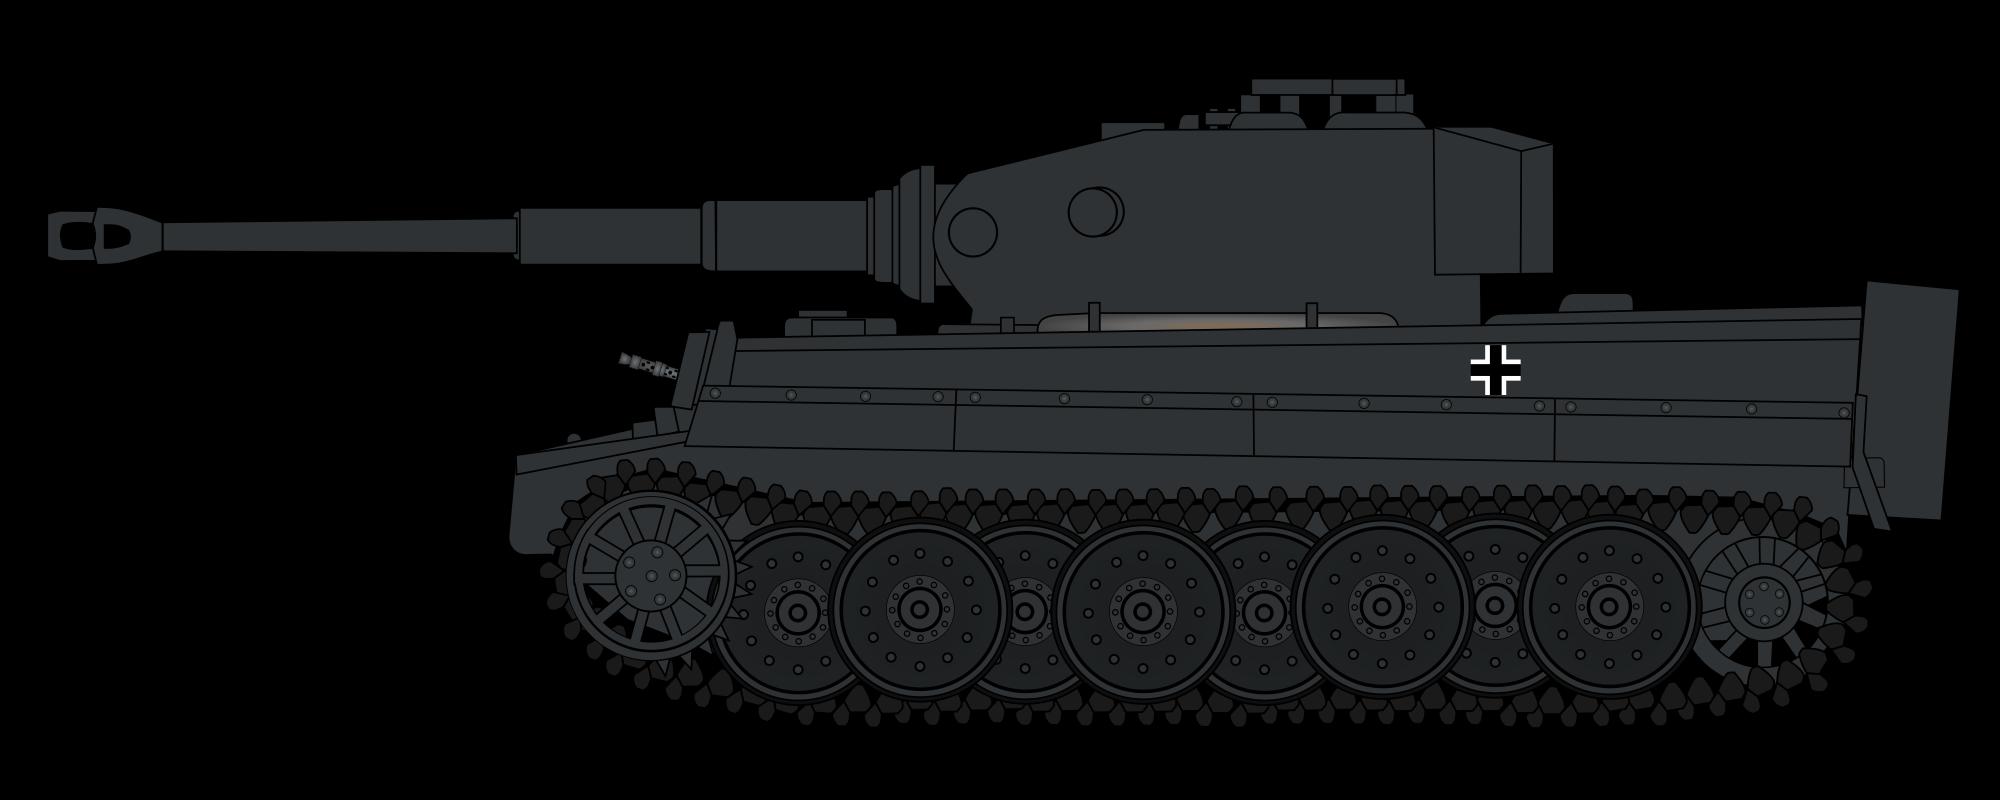 Tank svg #8, Download drawings